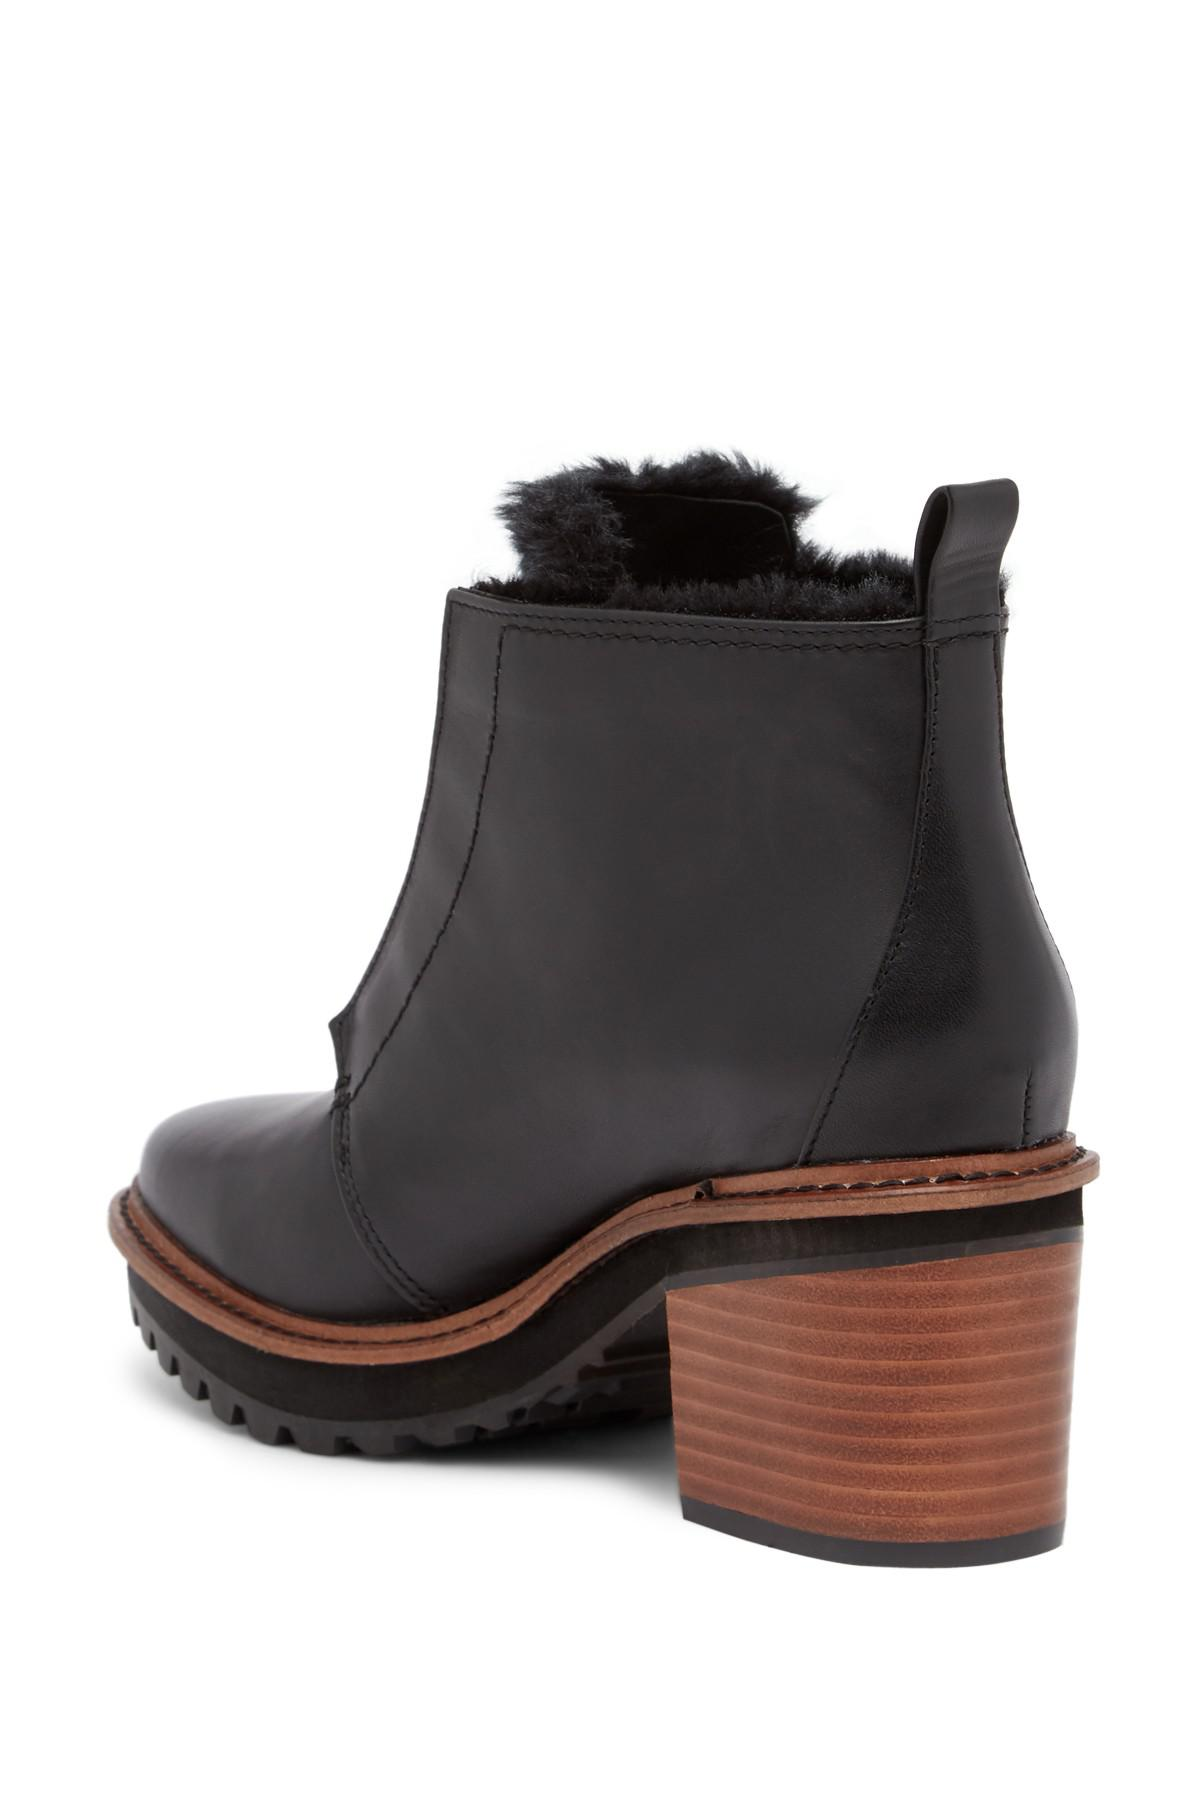 9d7b512a9412c Kelsi Dagger Brooklyn Patterson Faux Fur Lined Leather Boot in Black ...